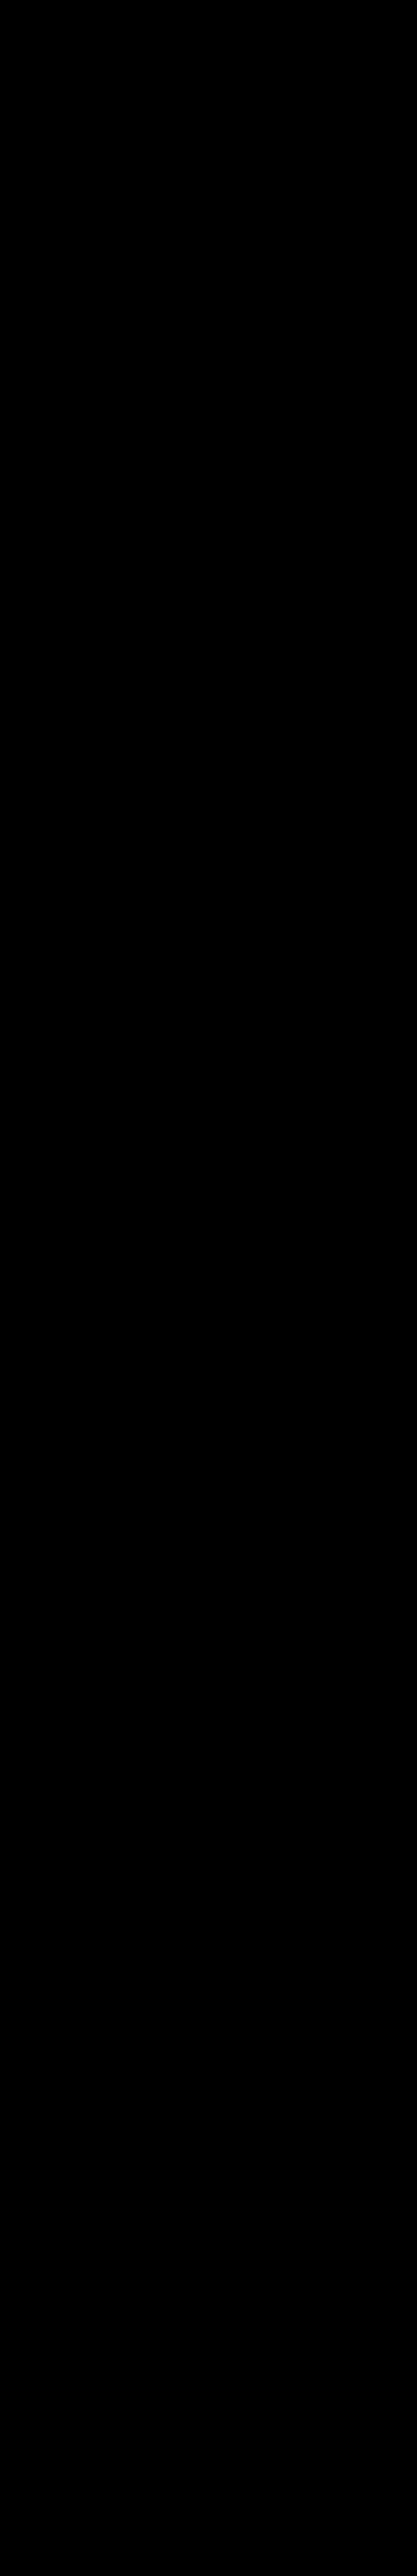 Image-Shr-walnut